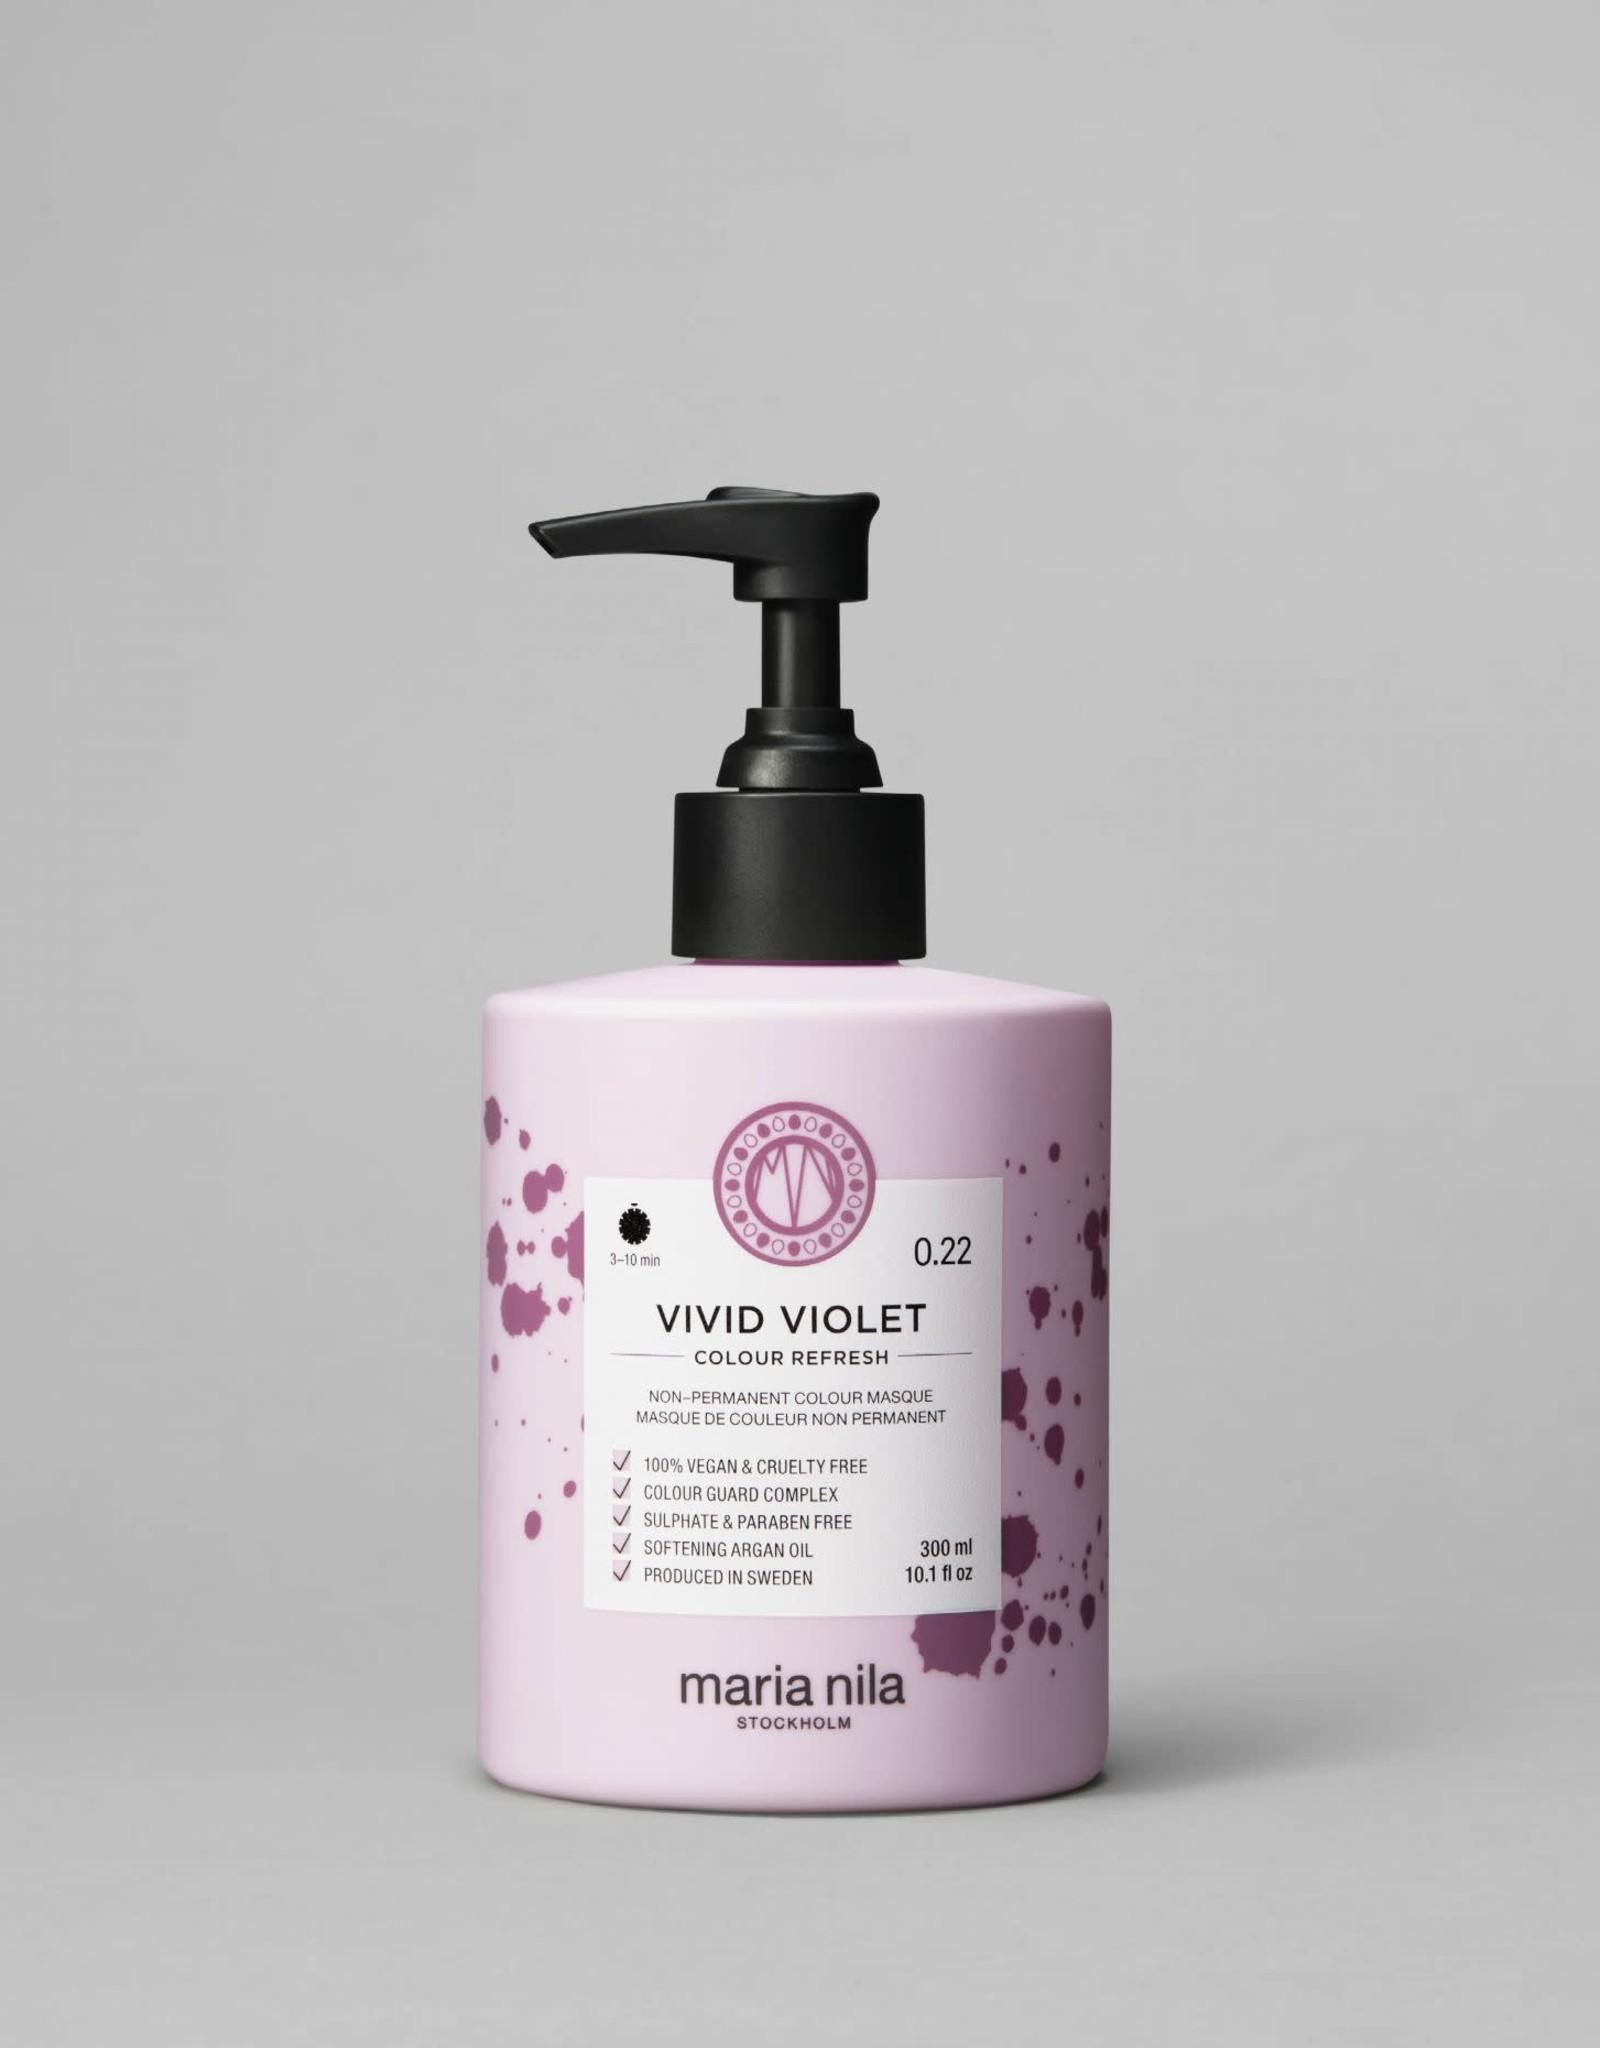 Maria Nila Colour Refresh Vivid Violet 300ml